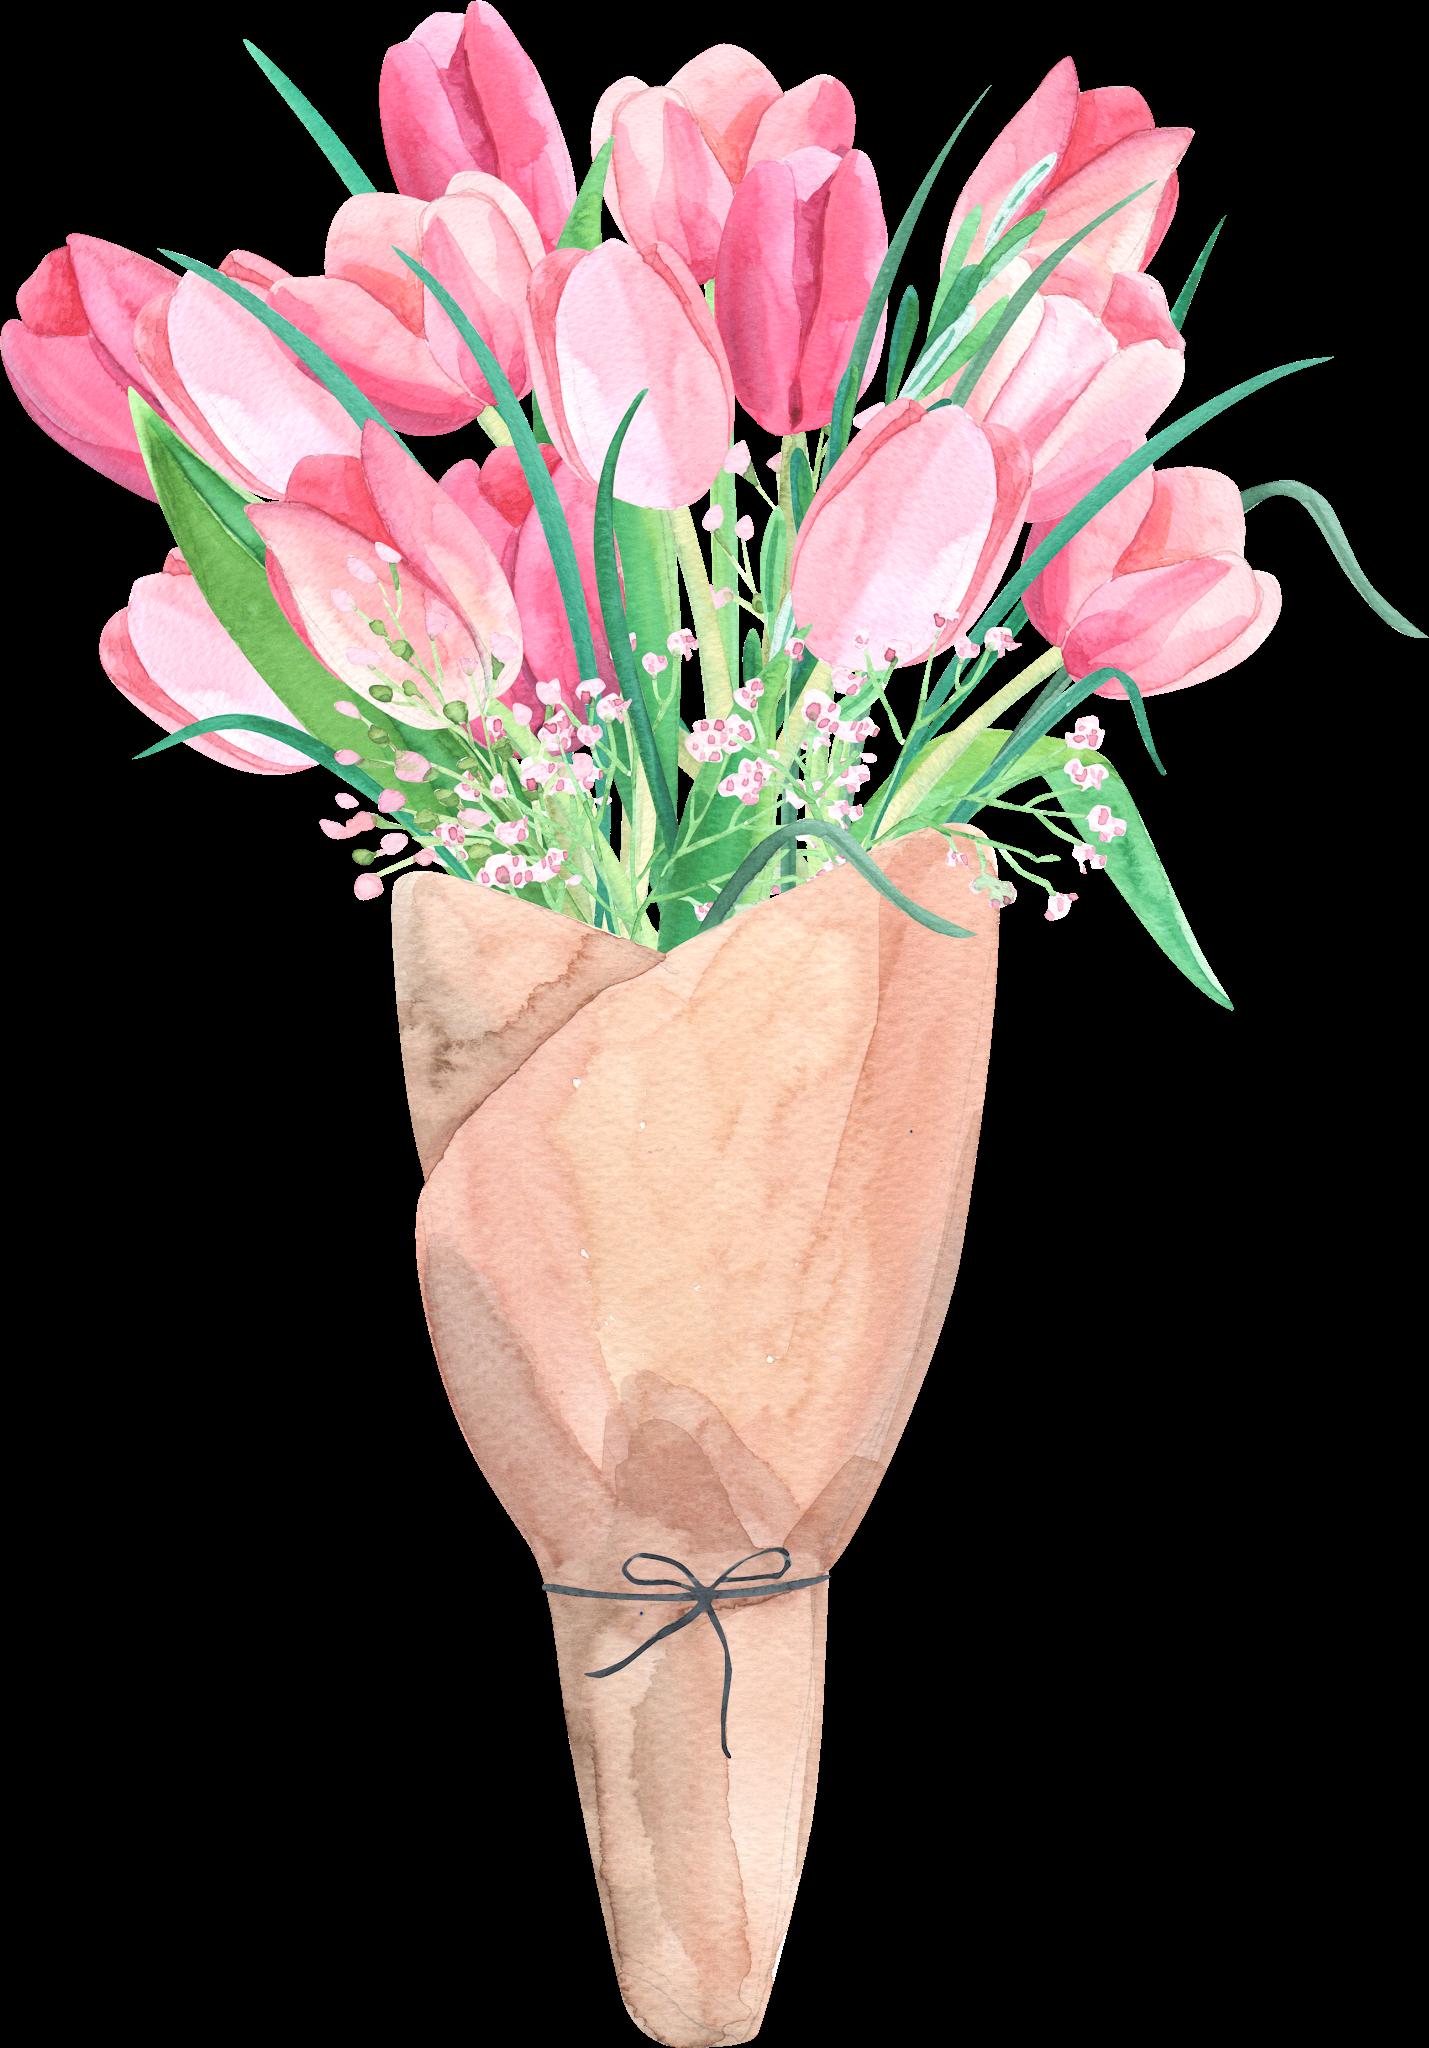 Tulip Flower Bouquet Clip Art Tulip Gift Flower Bouquet Box Flower Bouquet Boxes Tulips Flowers Flowers